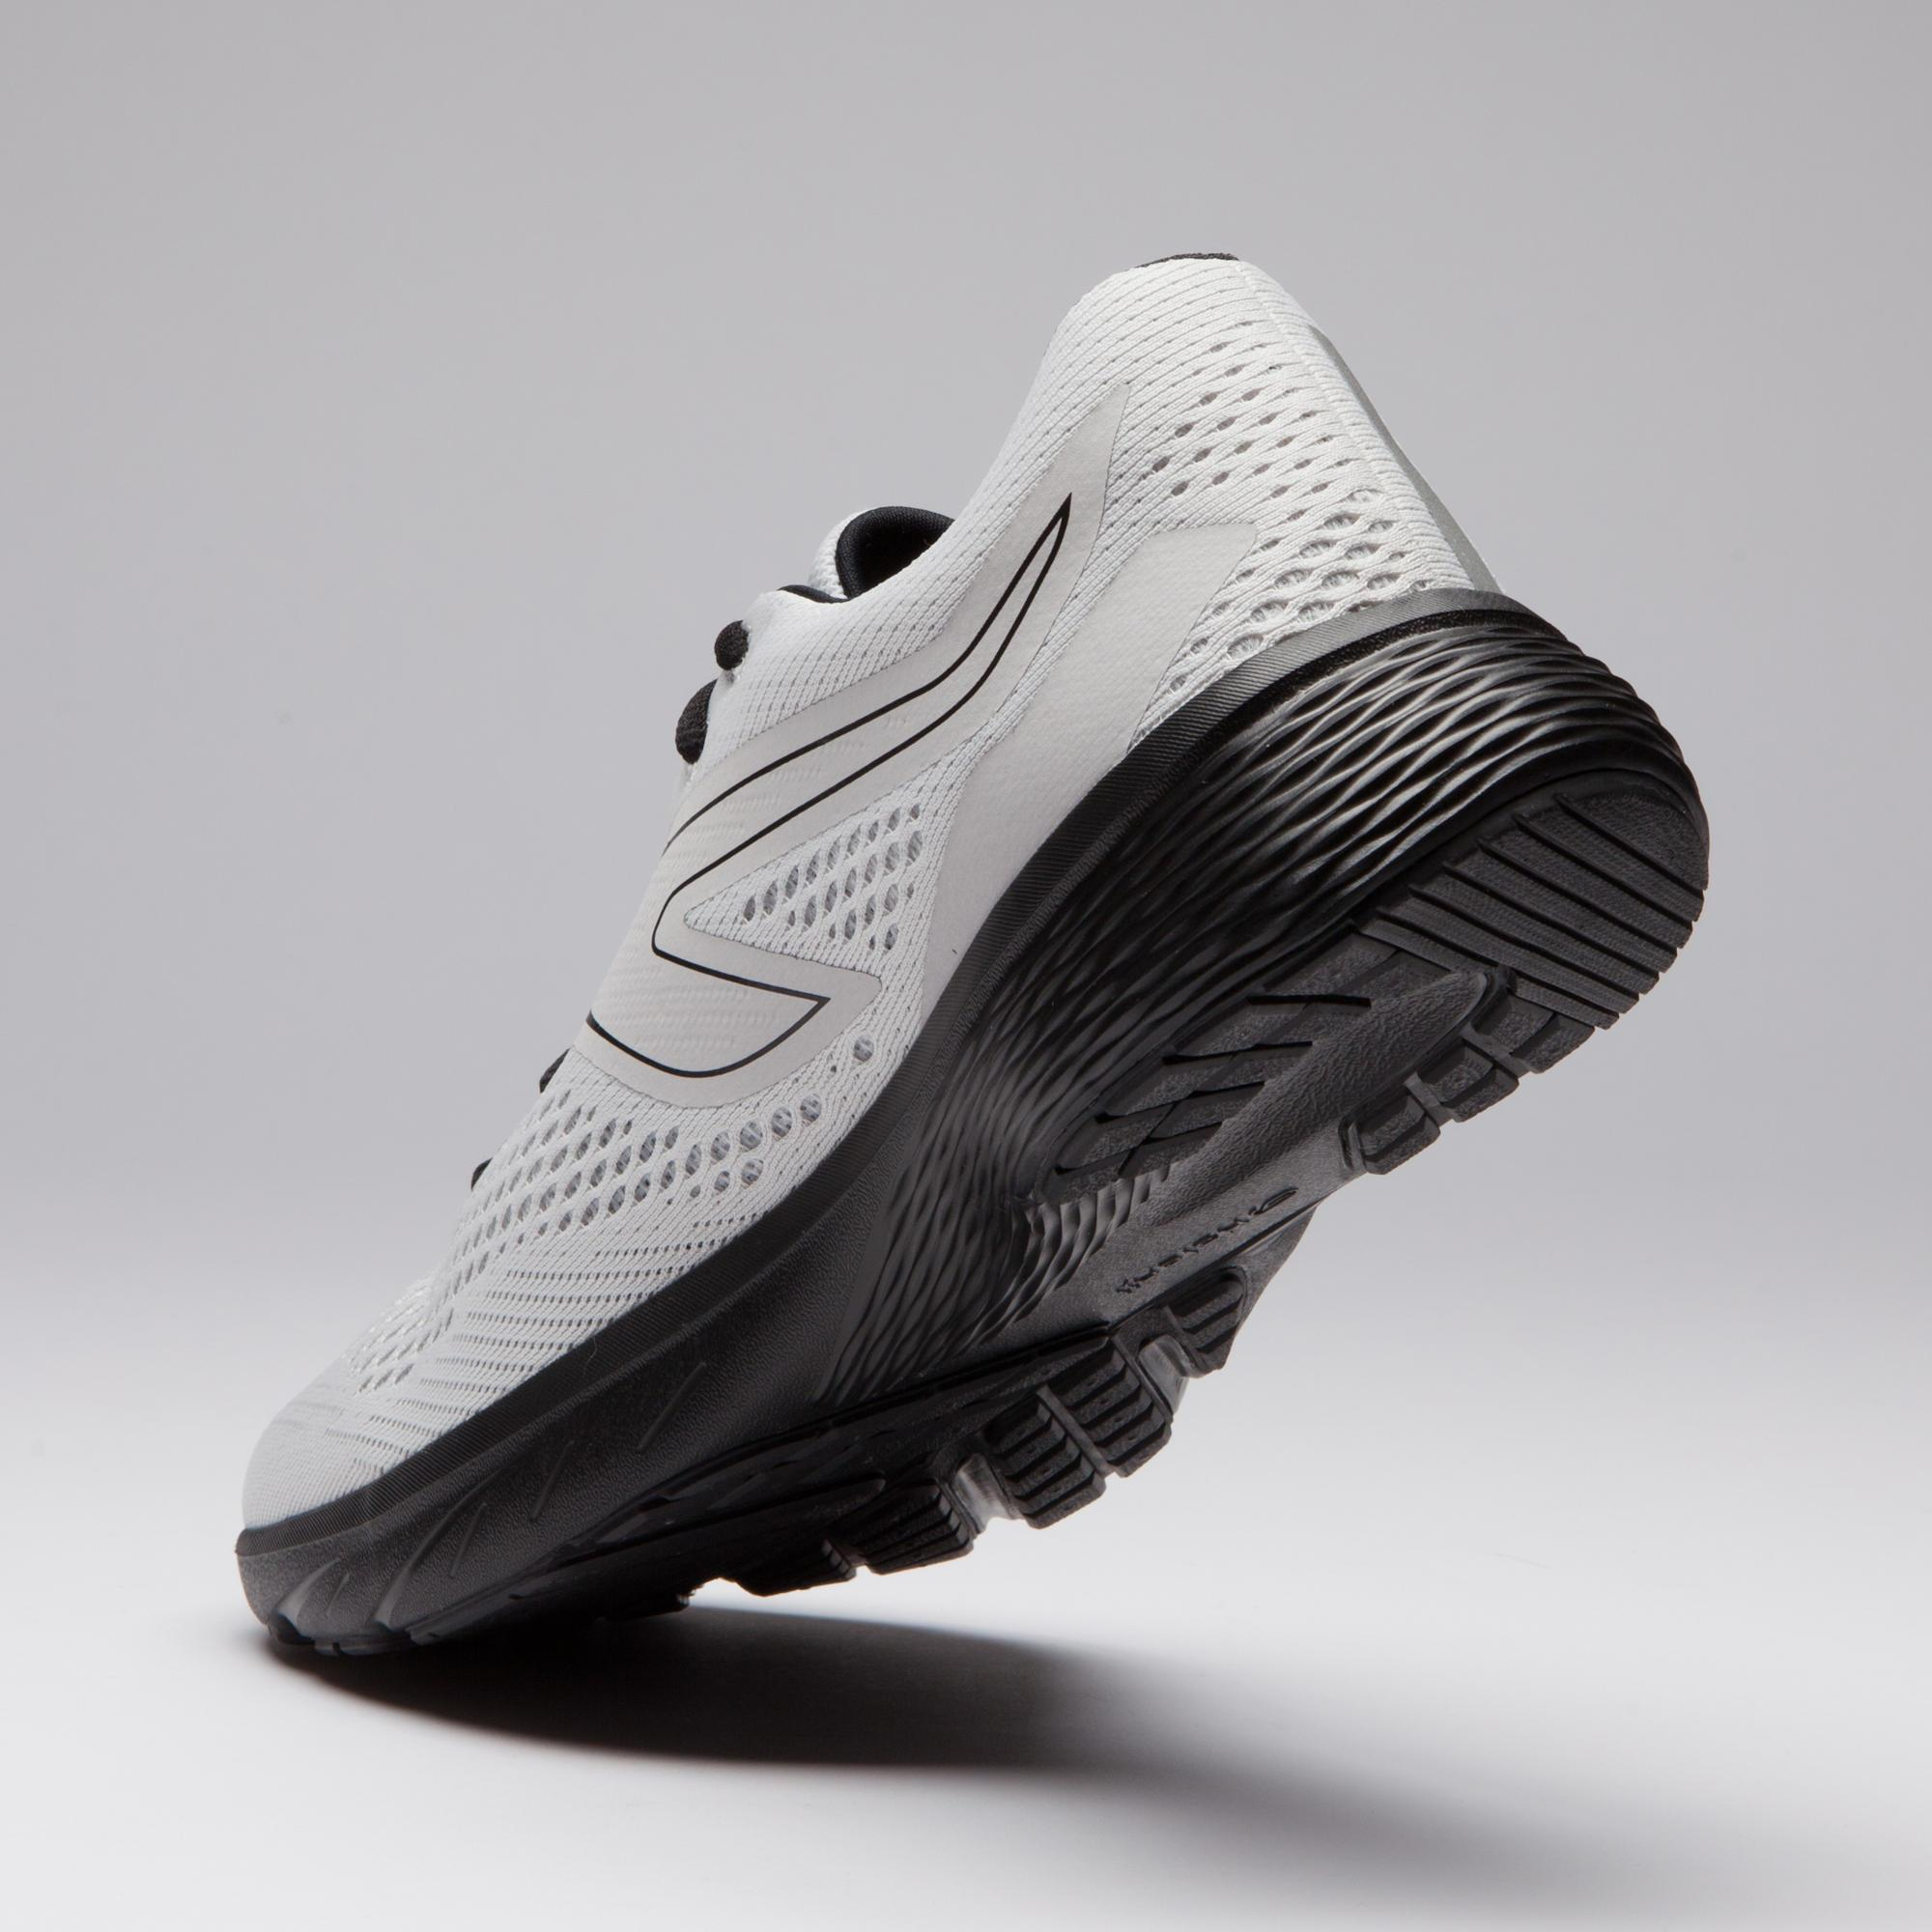 ca3647a1d Blancas Support De Running Kalenji Zapatillas Para Run Hombre WB8YxqFqw